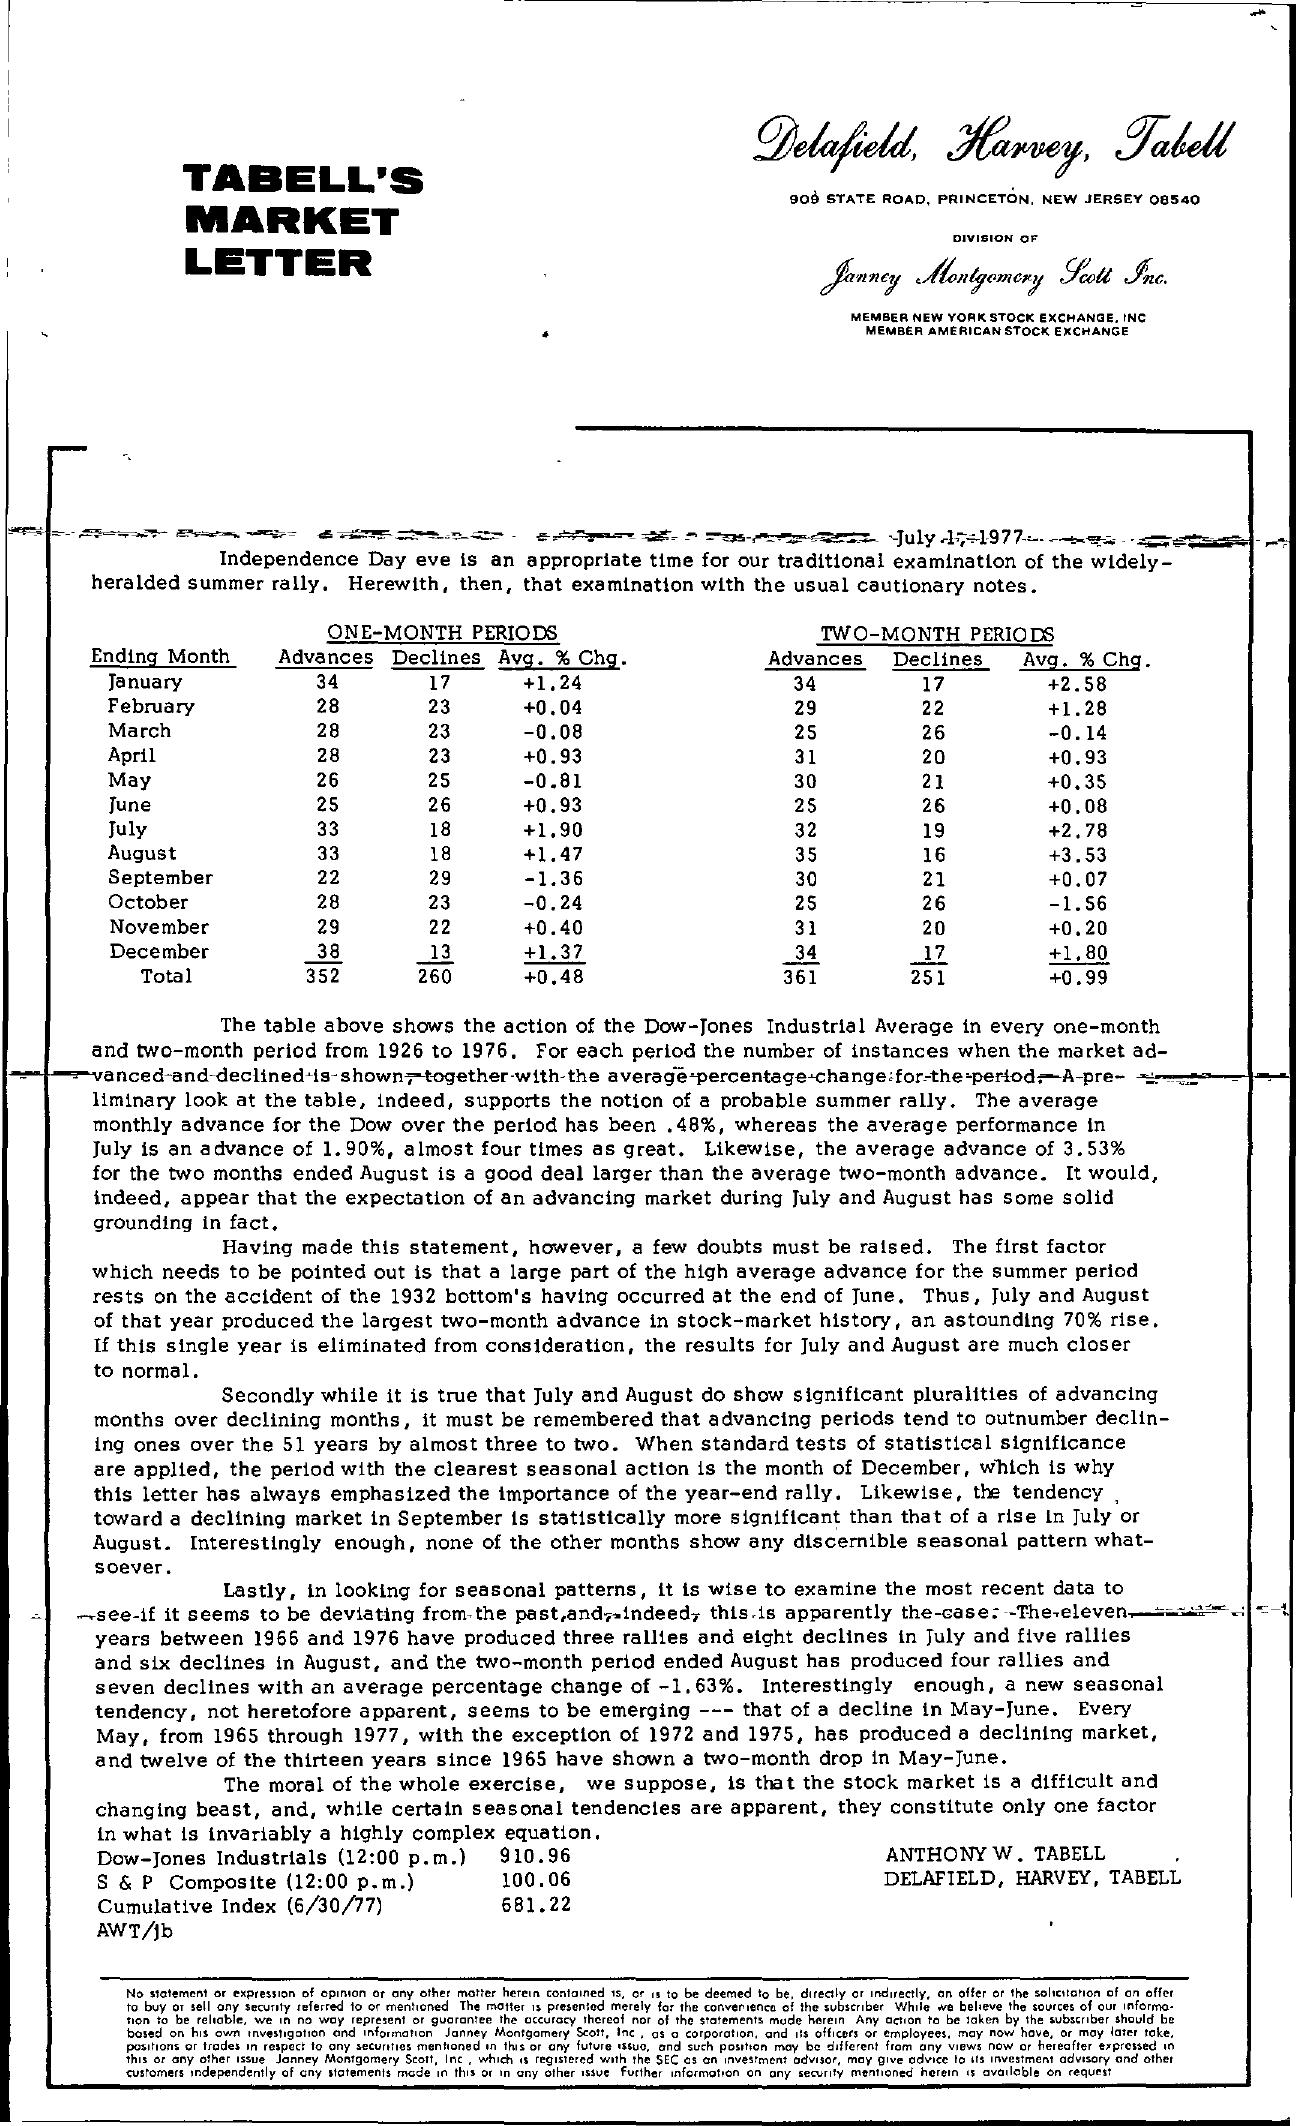 Tabell's Market Letter - July 01, 1977